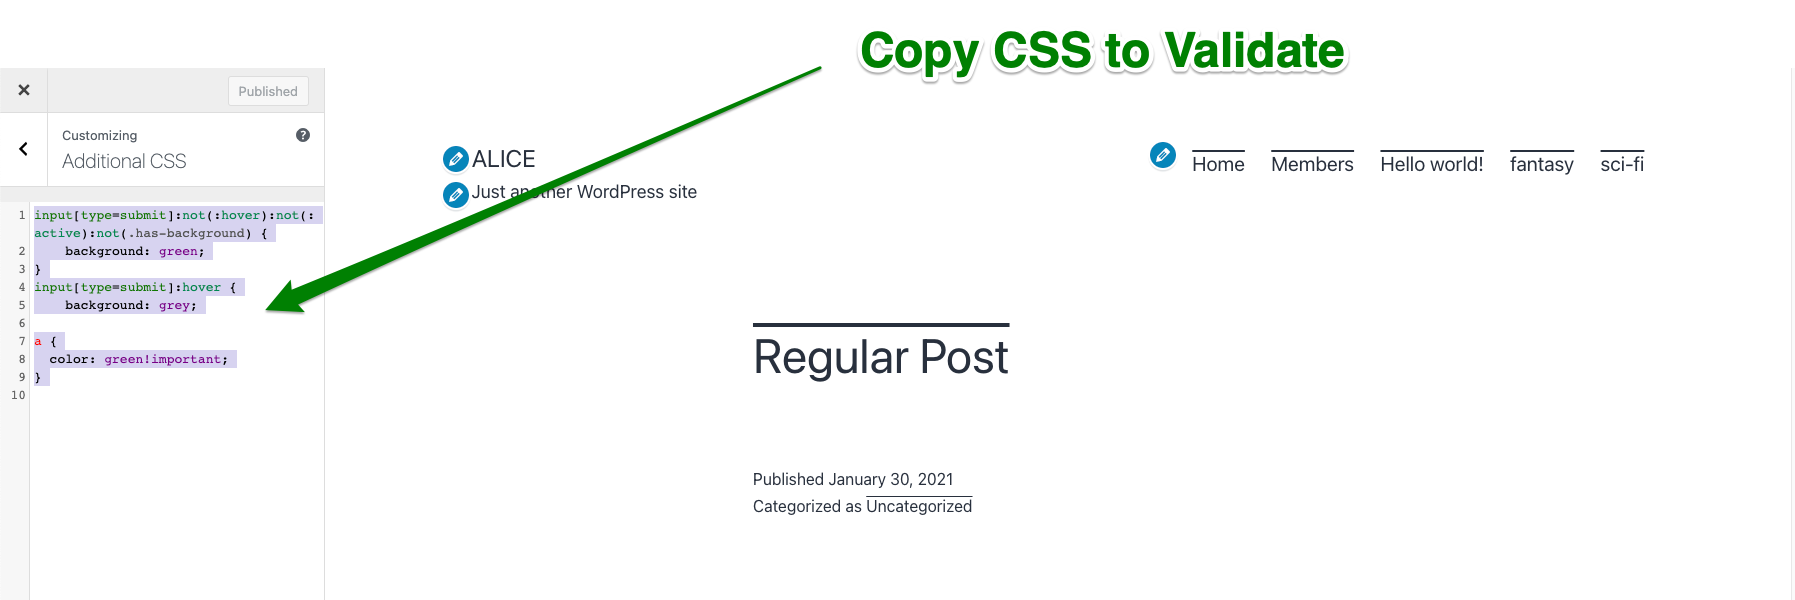 copy CSS with errors